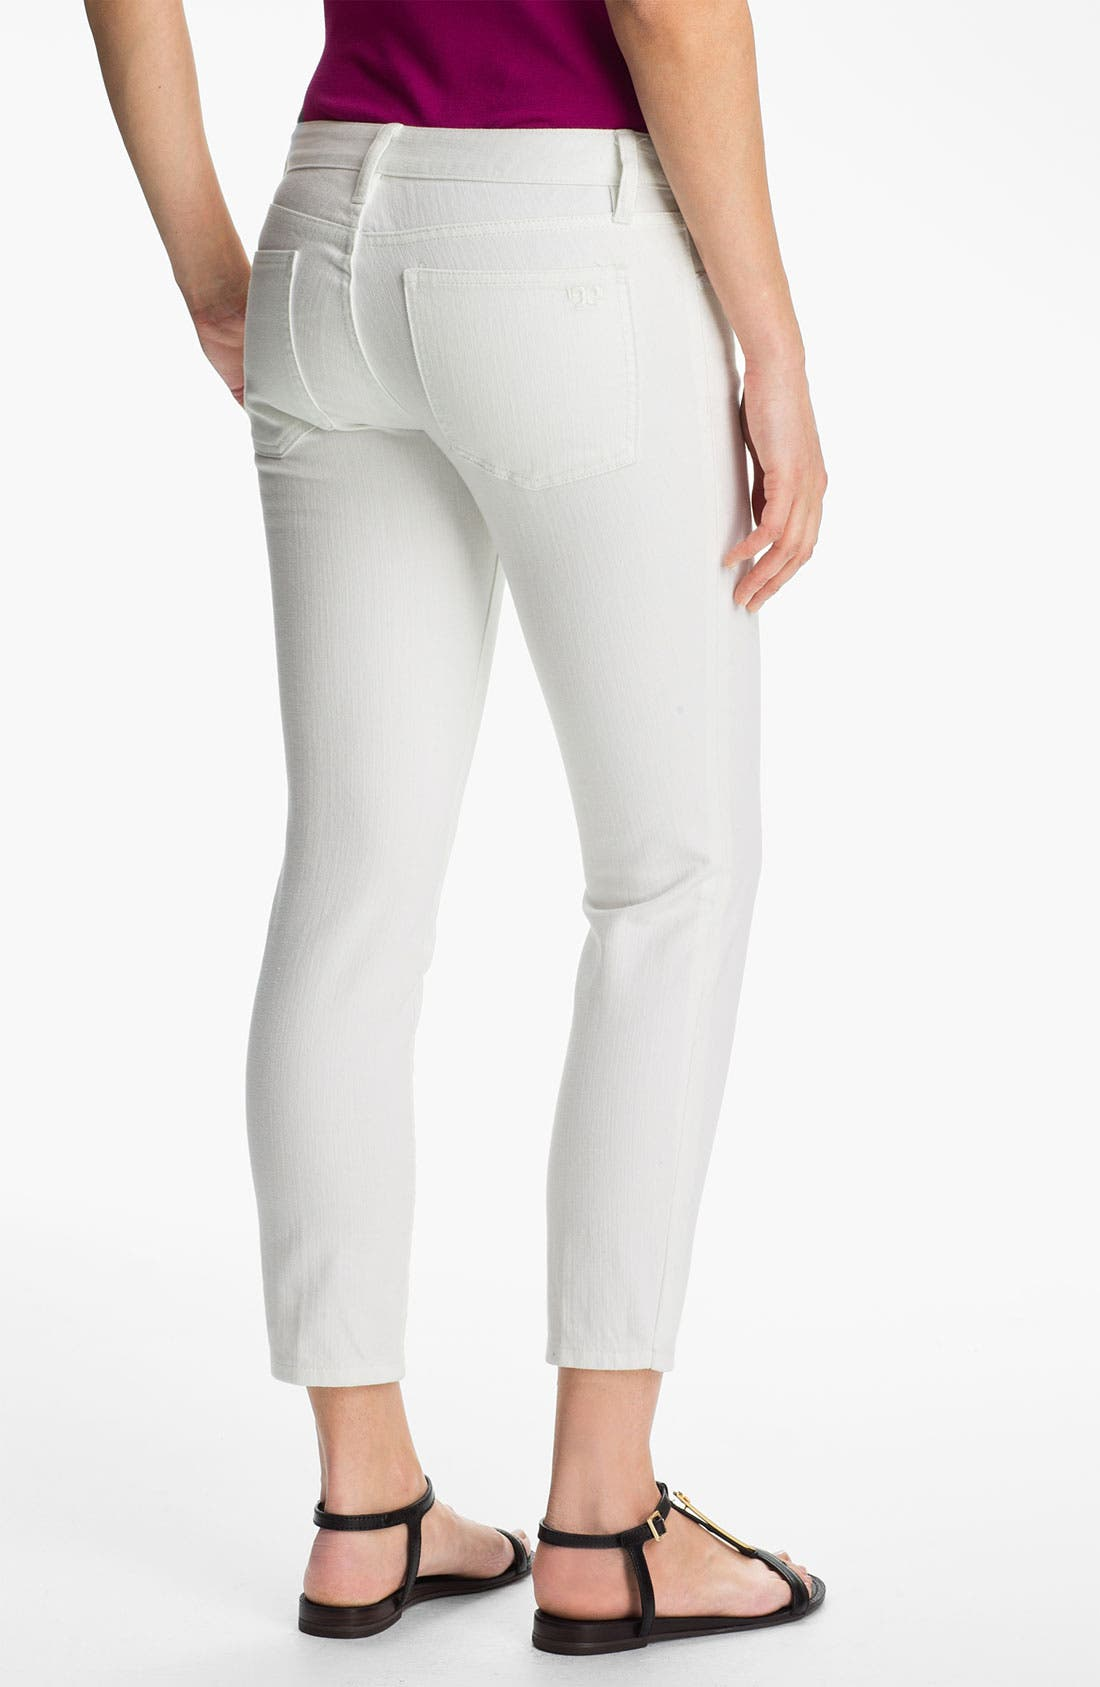 Alternate Image 2  - Tory Burch 'Alexa' Crop Skinny Stretch Jeans (Stone)